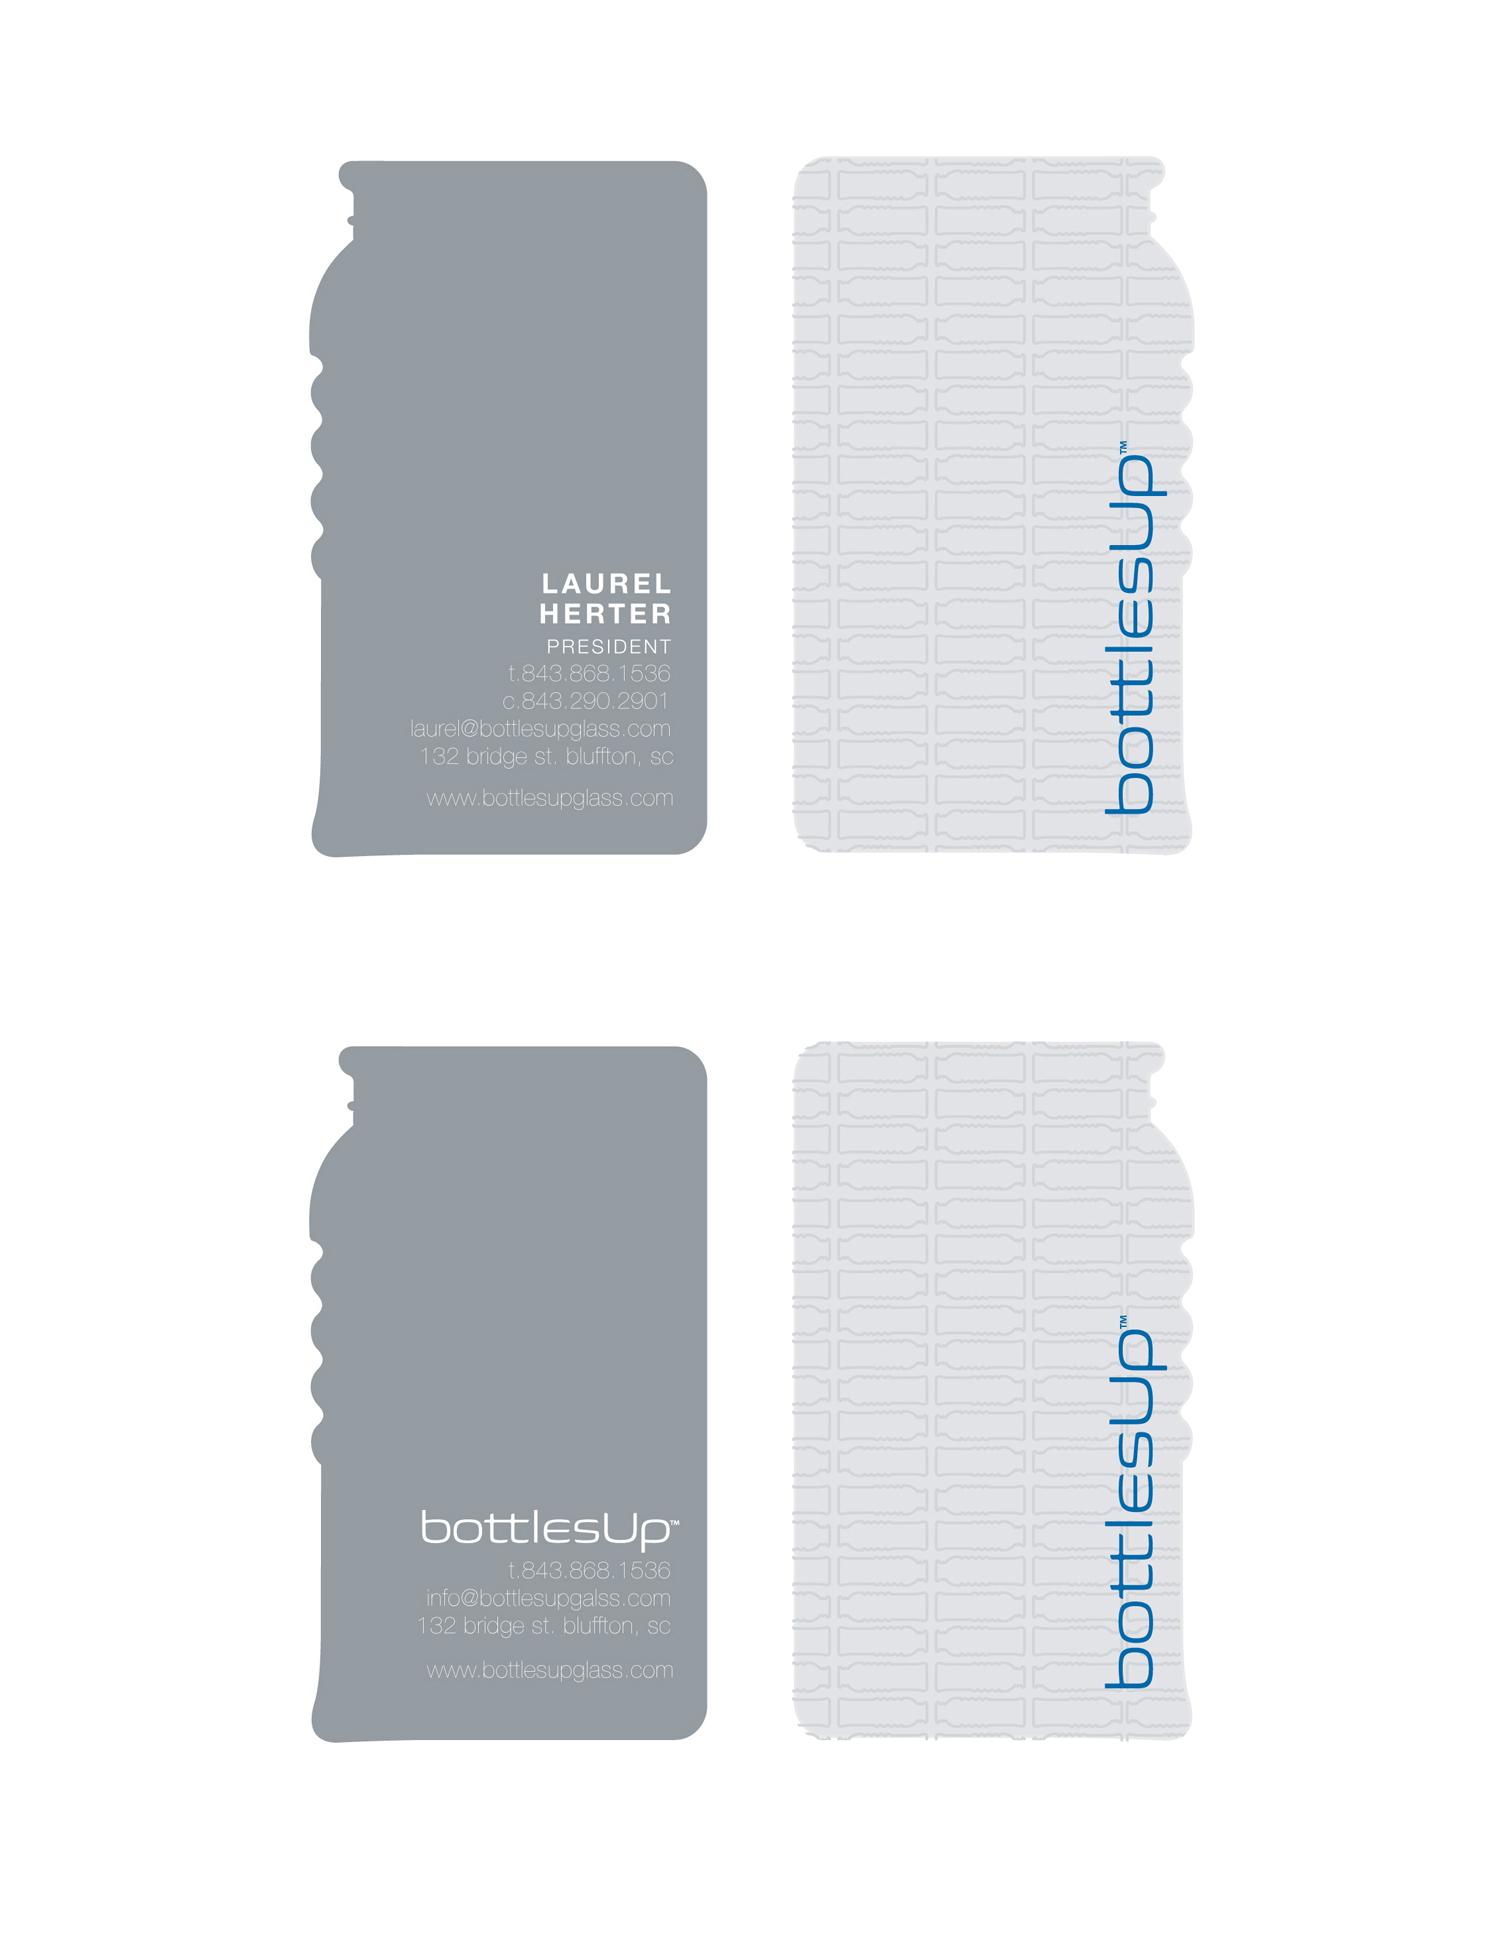 BottlesUp-CorporateIdentity-buscards.jpg